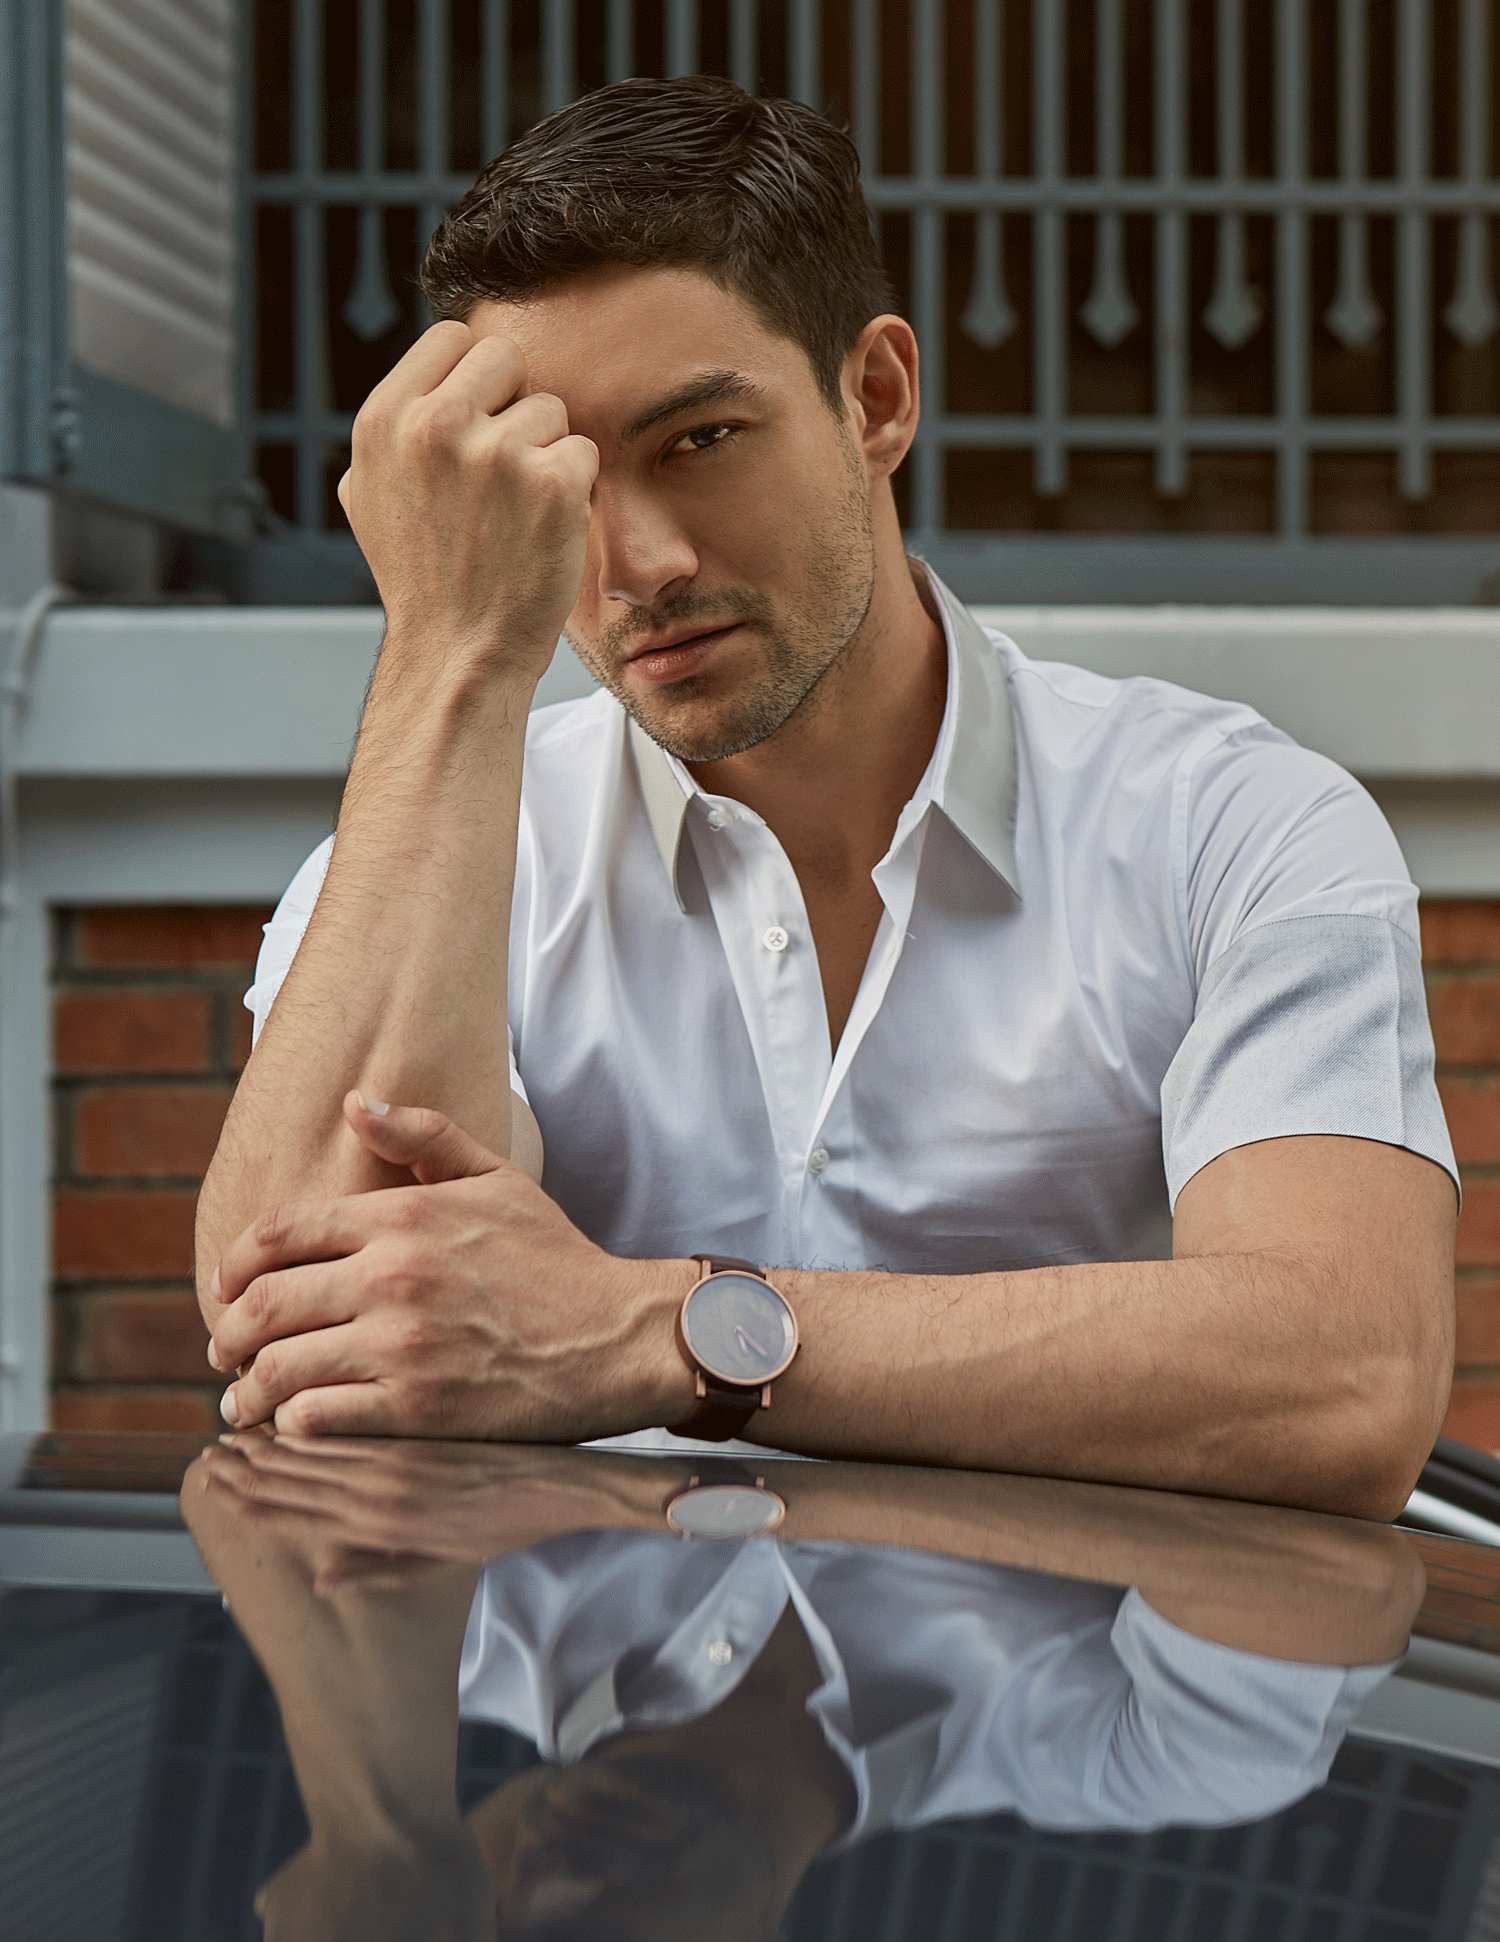 shirt : Jil Sander / watch : FORREST